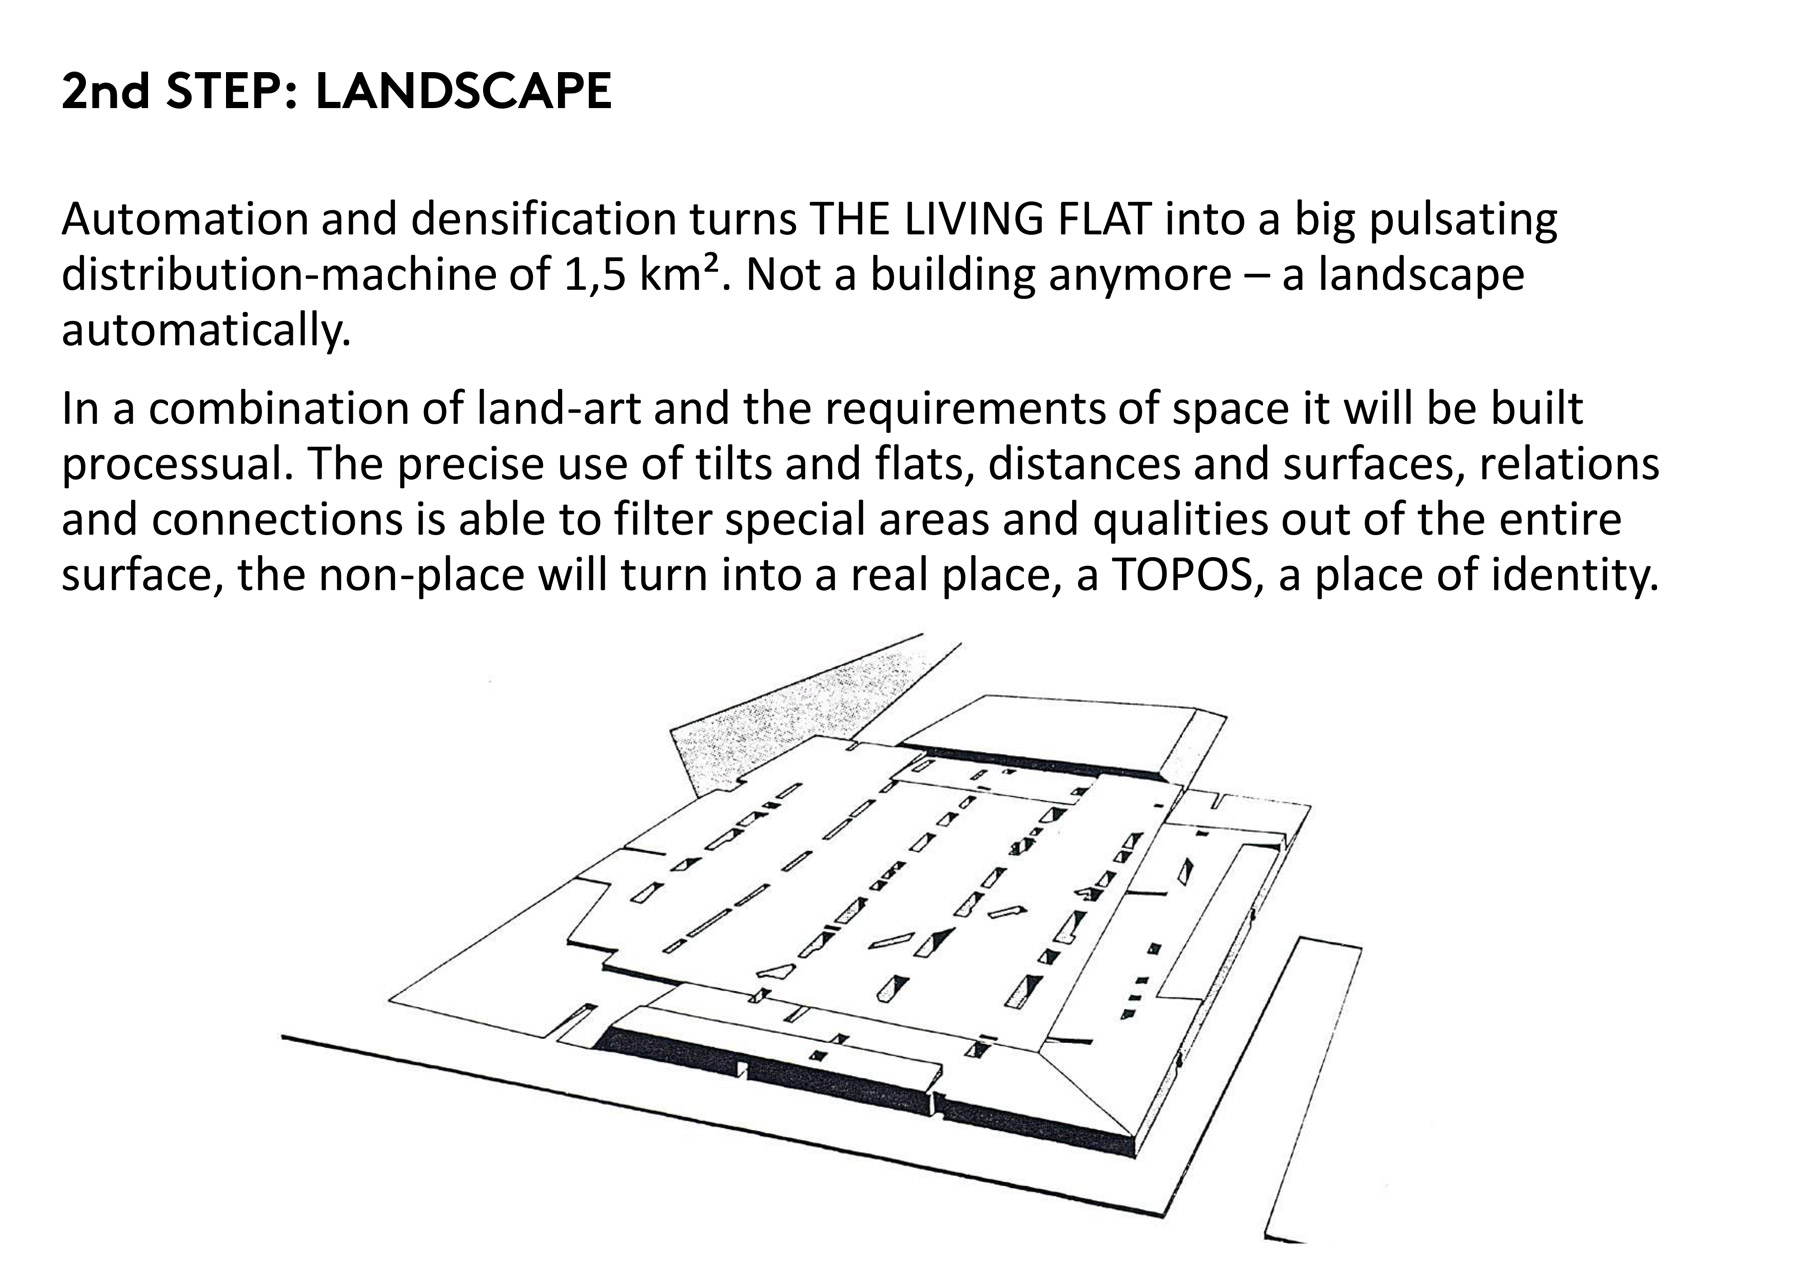 000_love_projects_living flat_slide_11